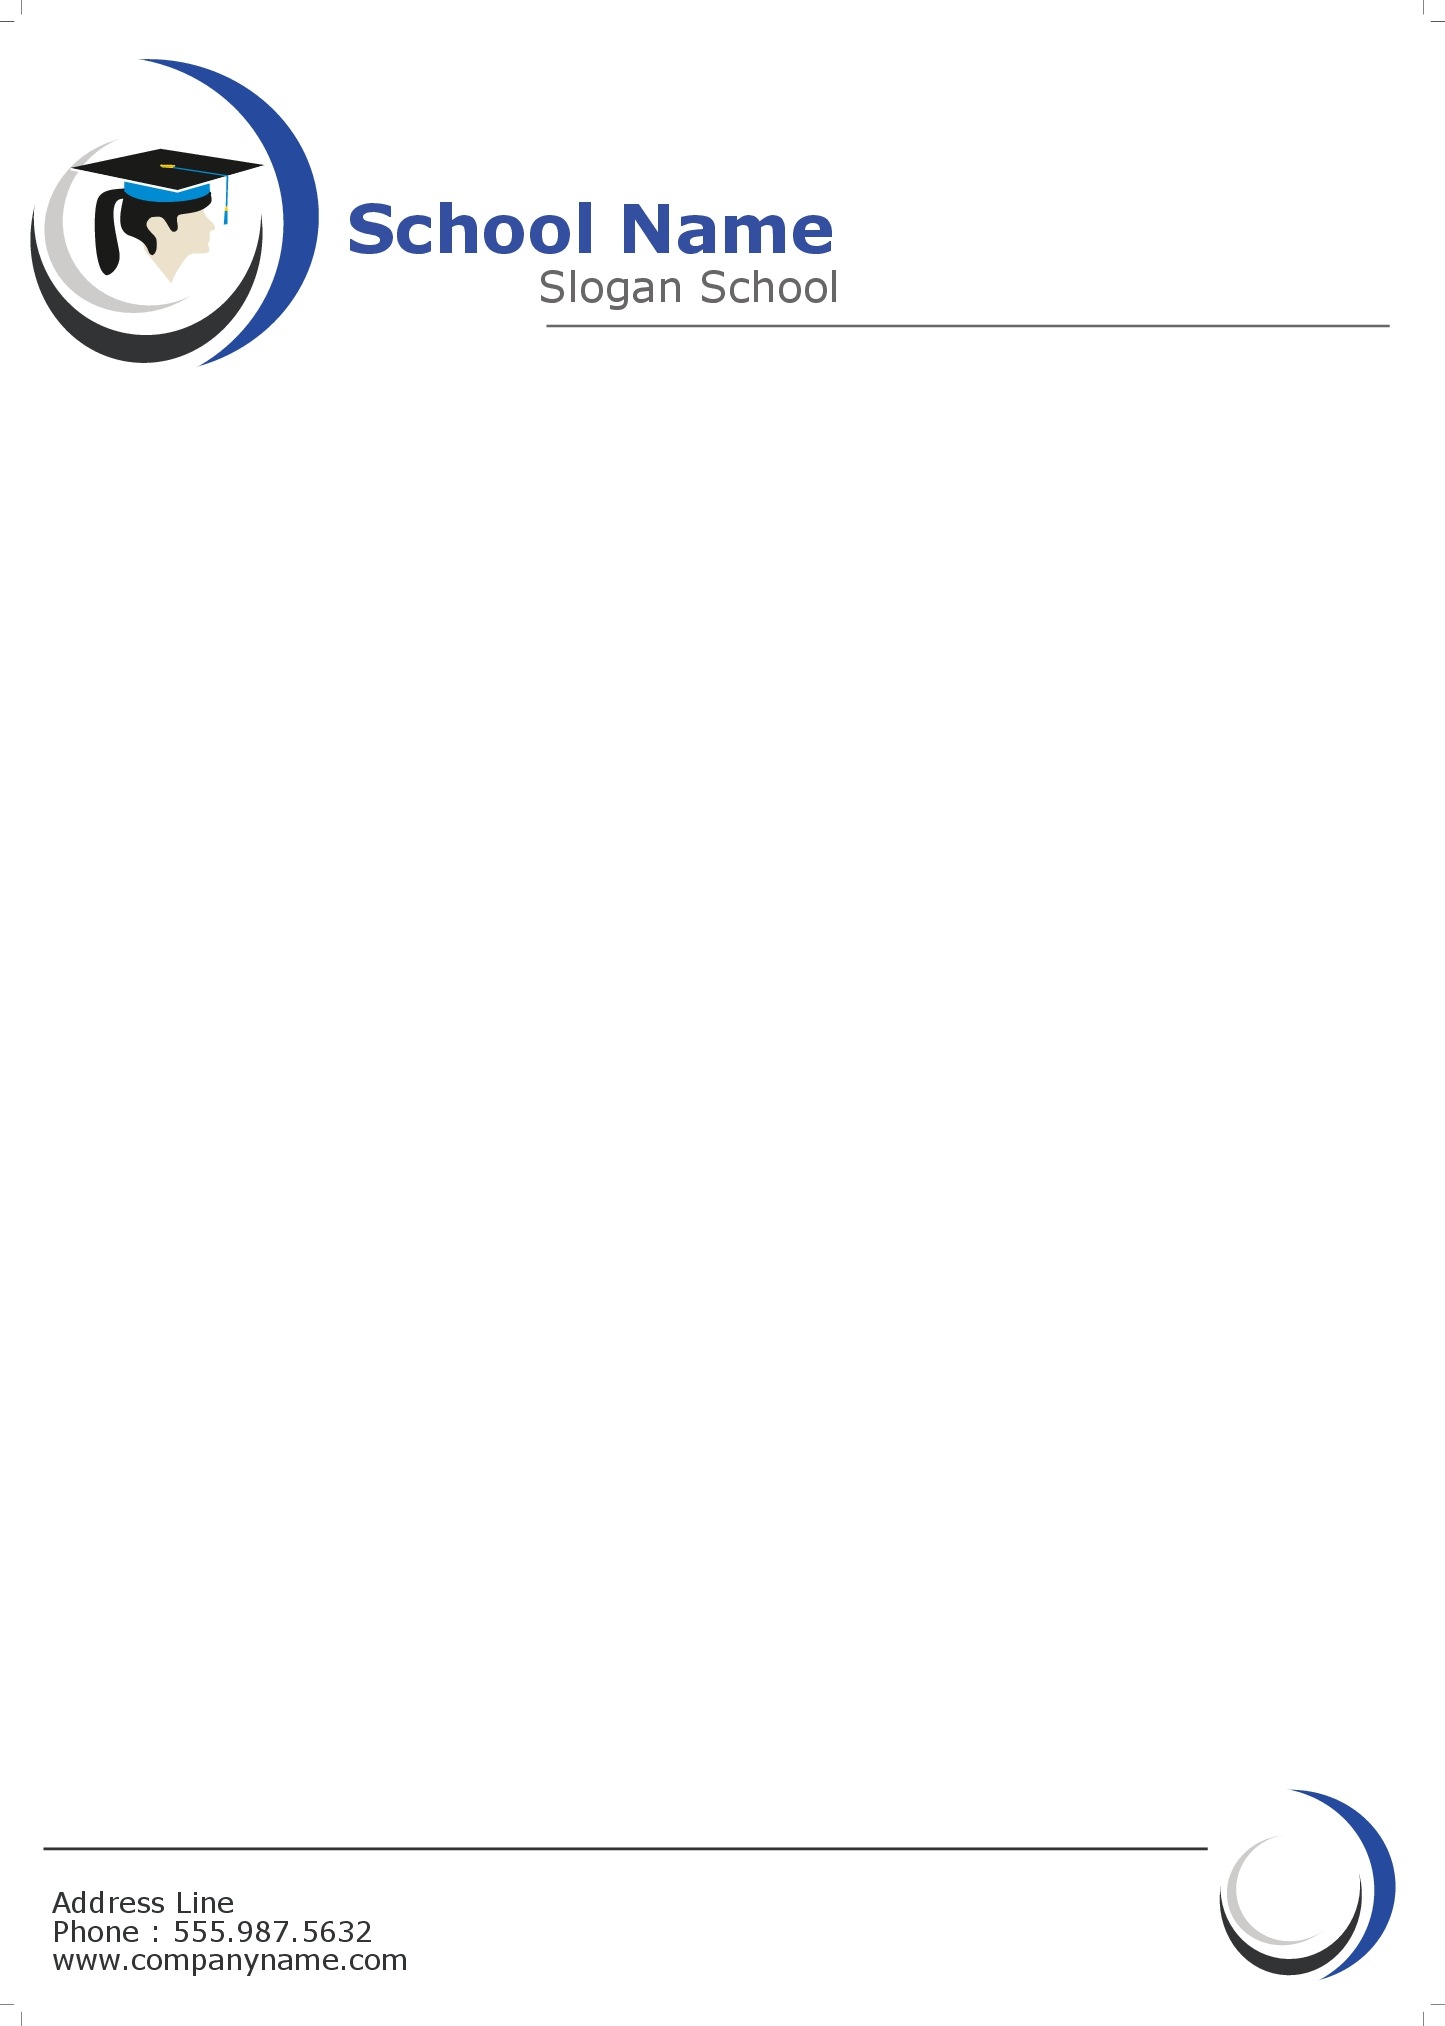 Professional business letterhead printing houston tx free shipping school letterhead 2 spiritdancerdesigns Gallery